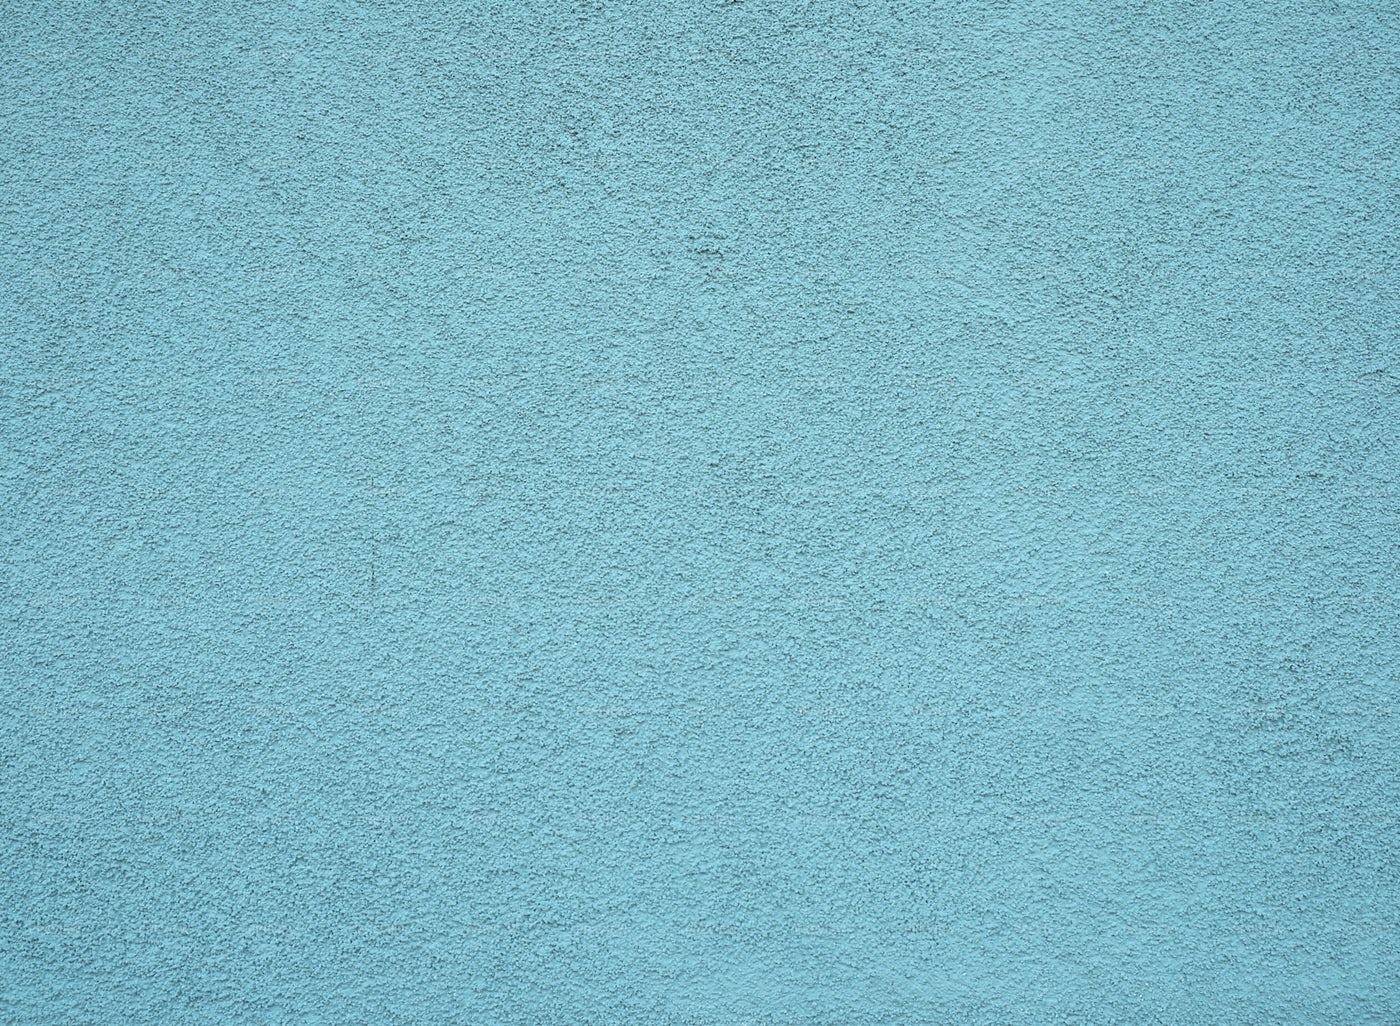 Blue Plaster Texture: Stock Photos